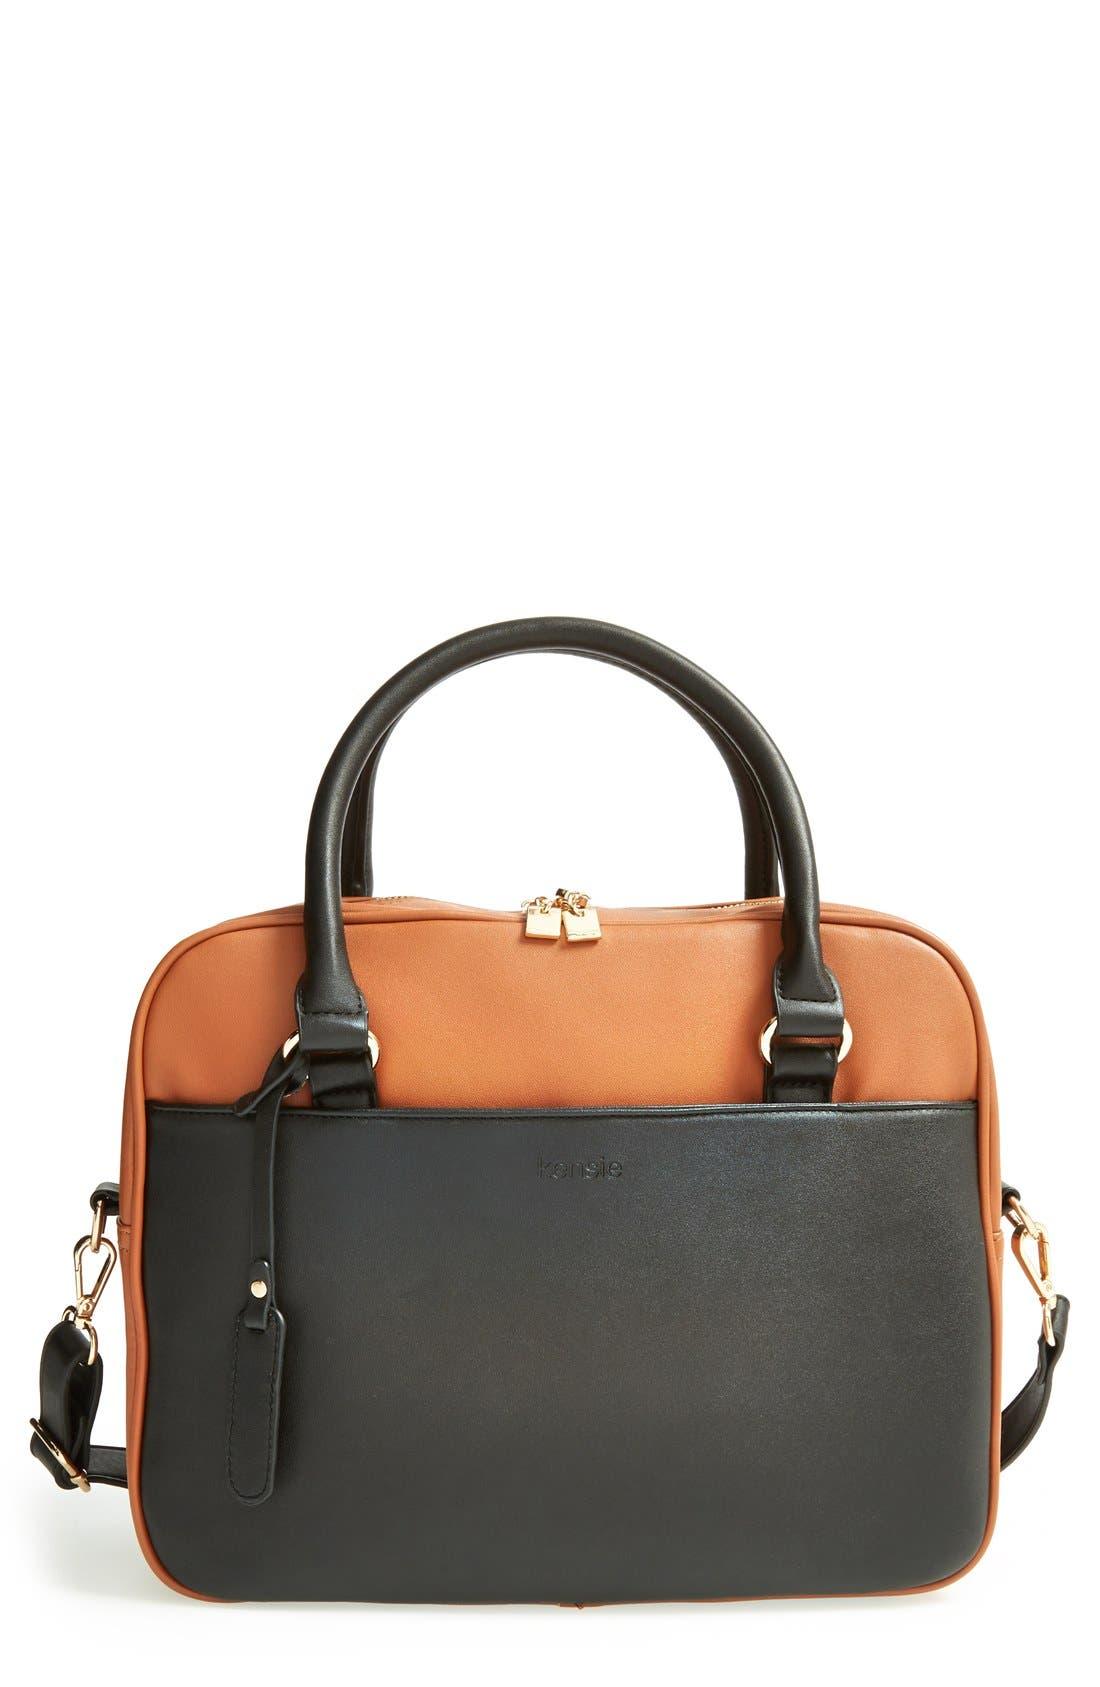 Main Image - kensie 'Block Party' Color Block Handbag